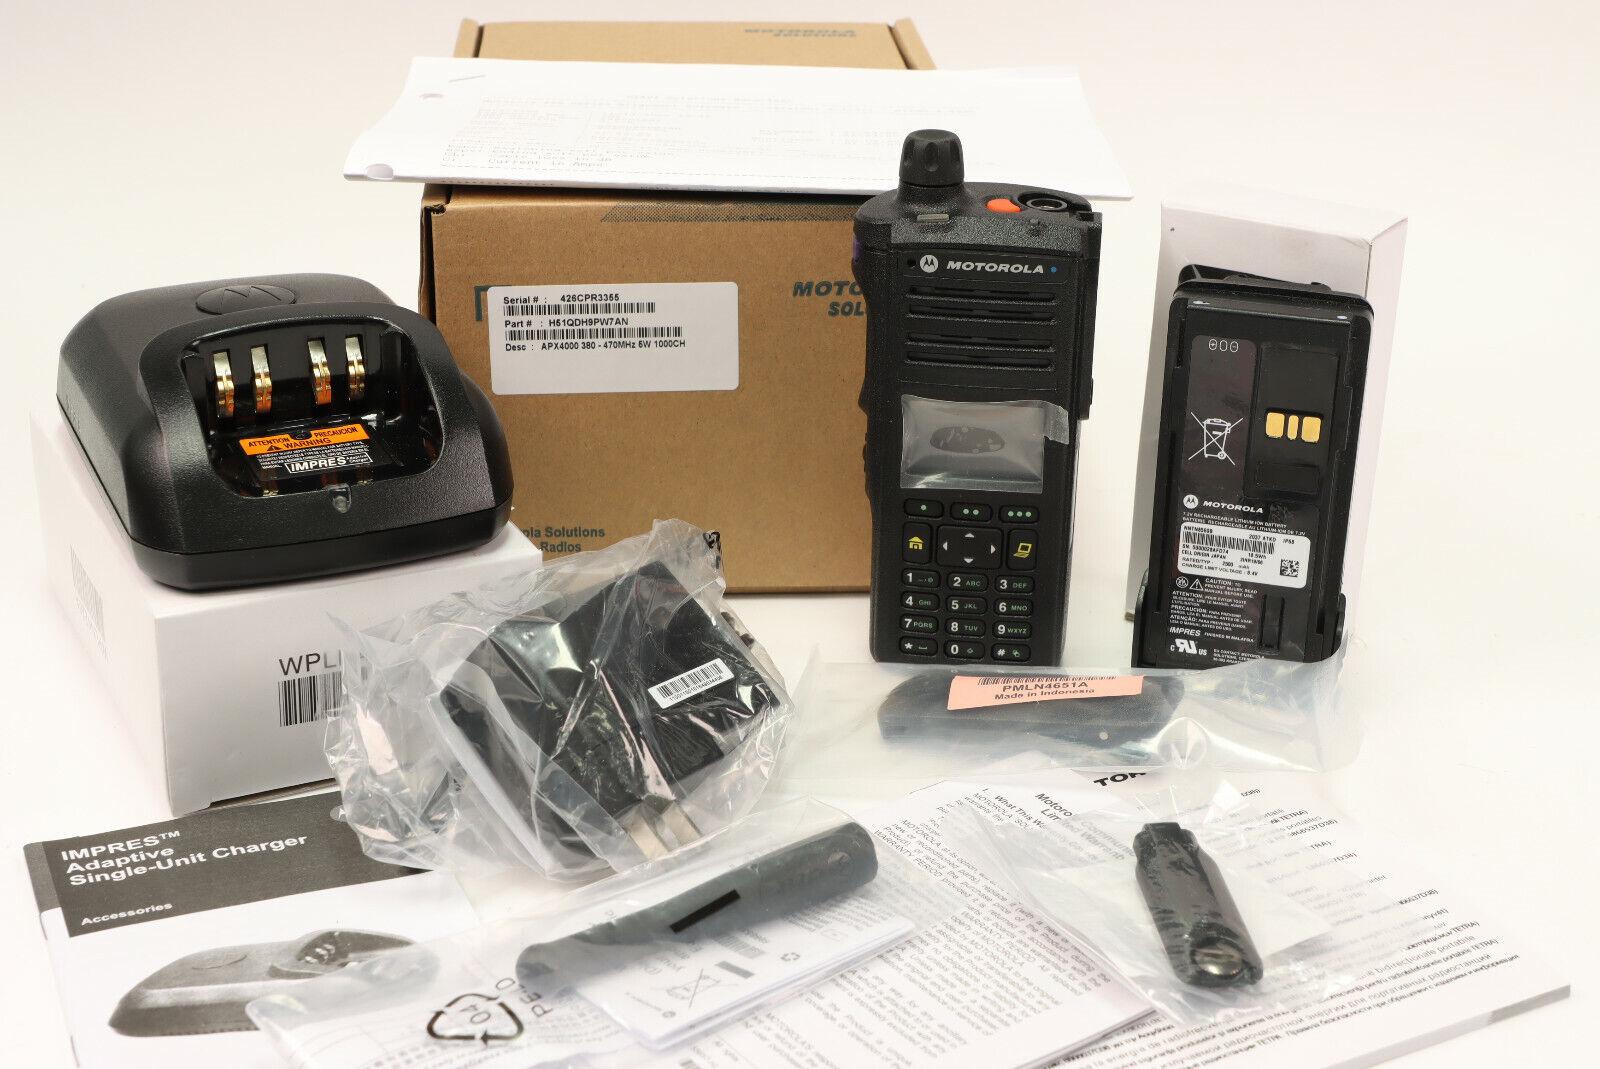 Motorola APX4000 UHF + FPP+ 5 Algo's + Bluetooth 1 knob 380-470MHz w/tags. Buy it now for 950.00